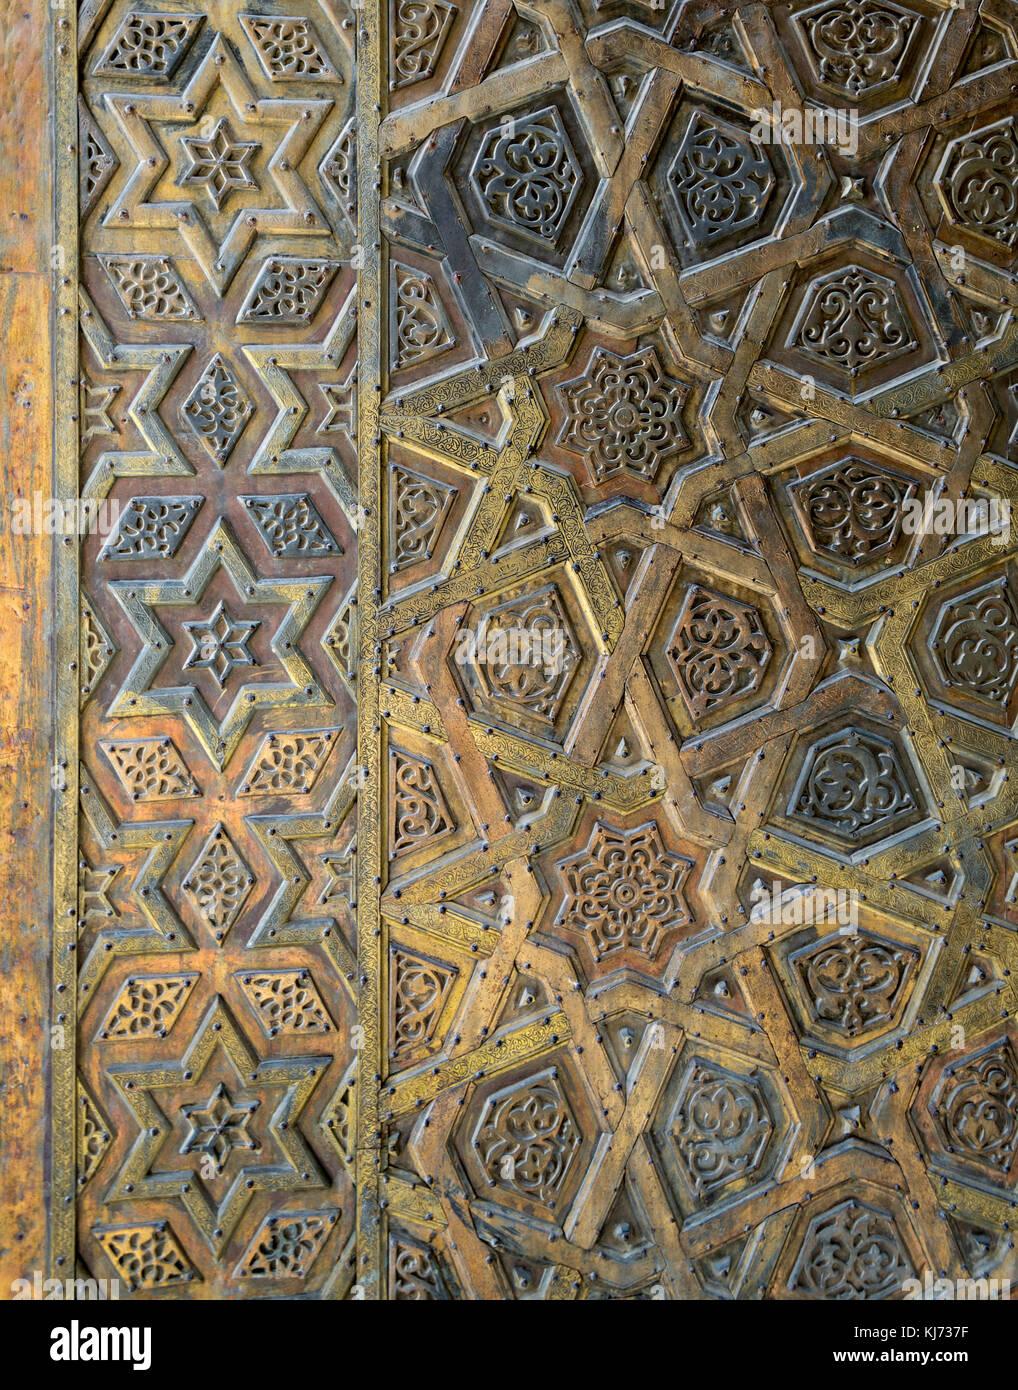 Ornaments of the bronze-plate door of Sultan Qalawun mosque, al Moez street, Old Cairo, Egypt - Stock Image